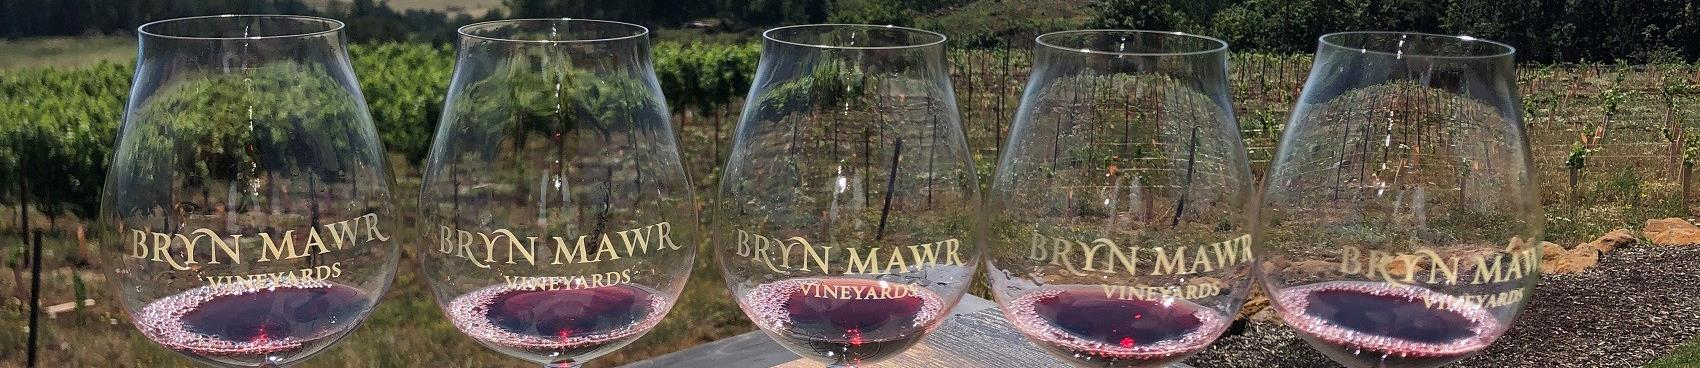 Estate Pinot Noir Vertical Tasting